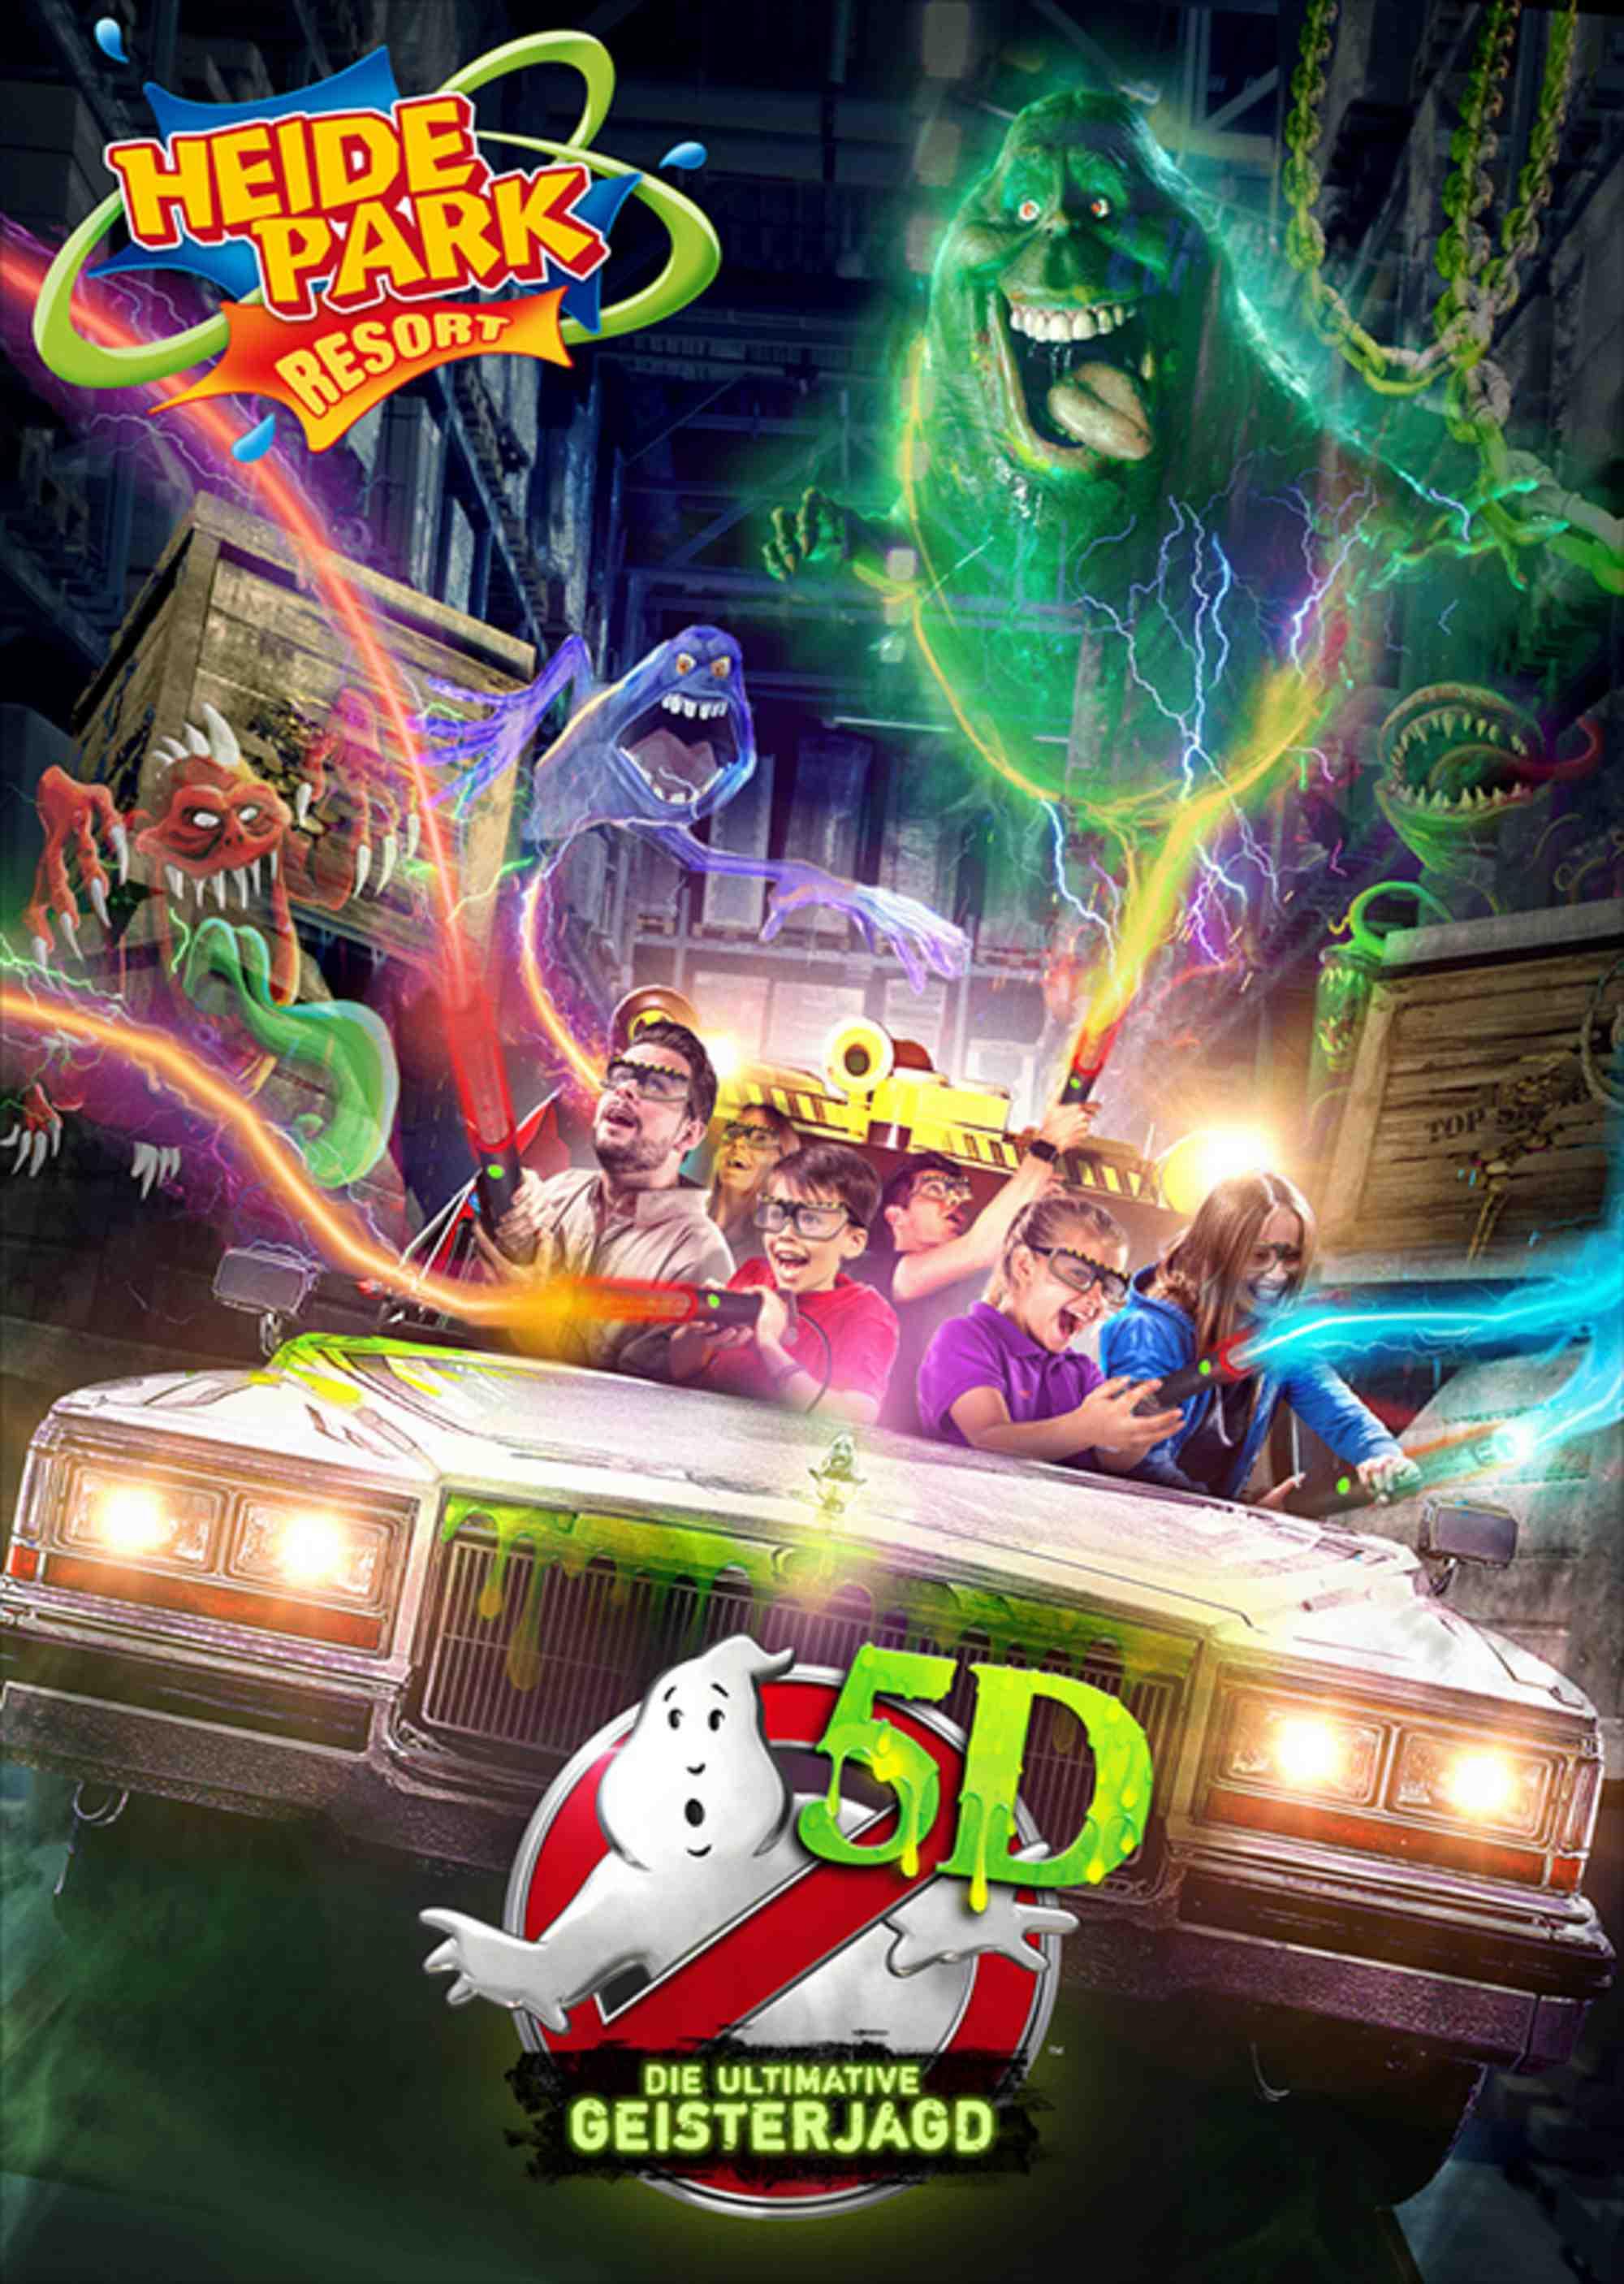 ghostbusters, heide park